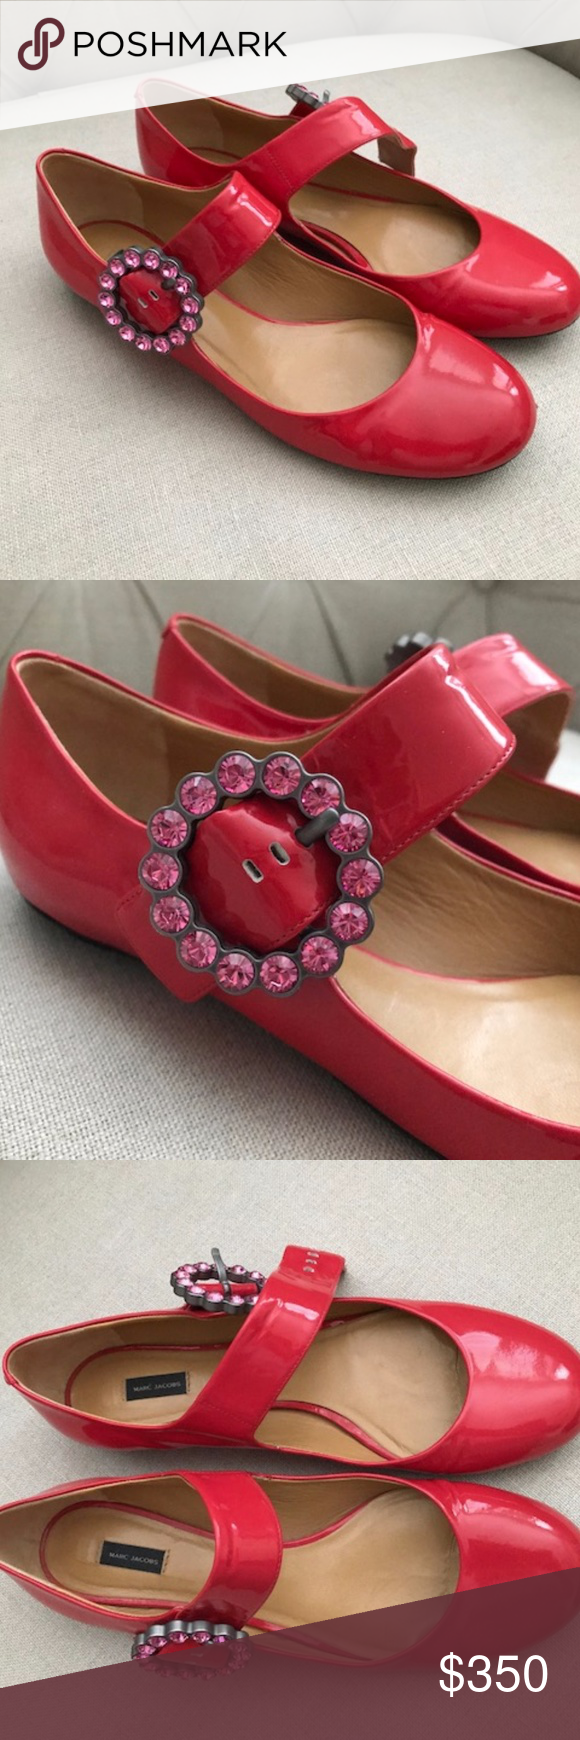 Marc Jacobs Red Shoes Swarovski ♦️